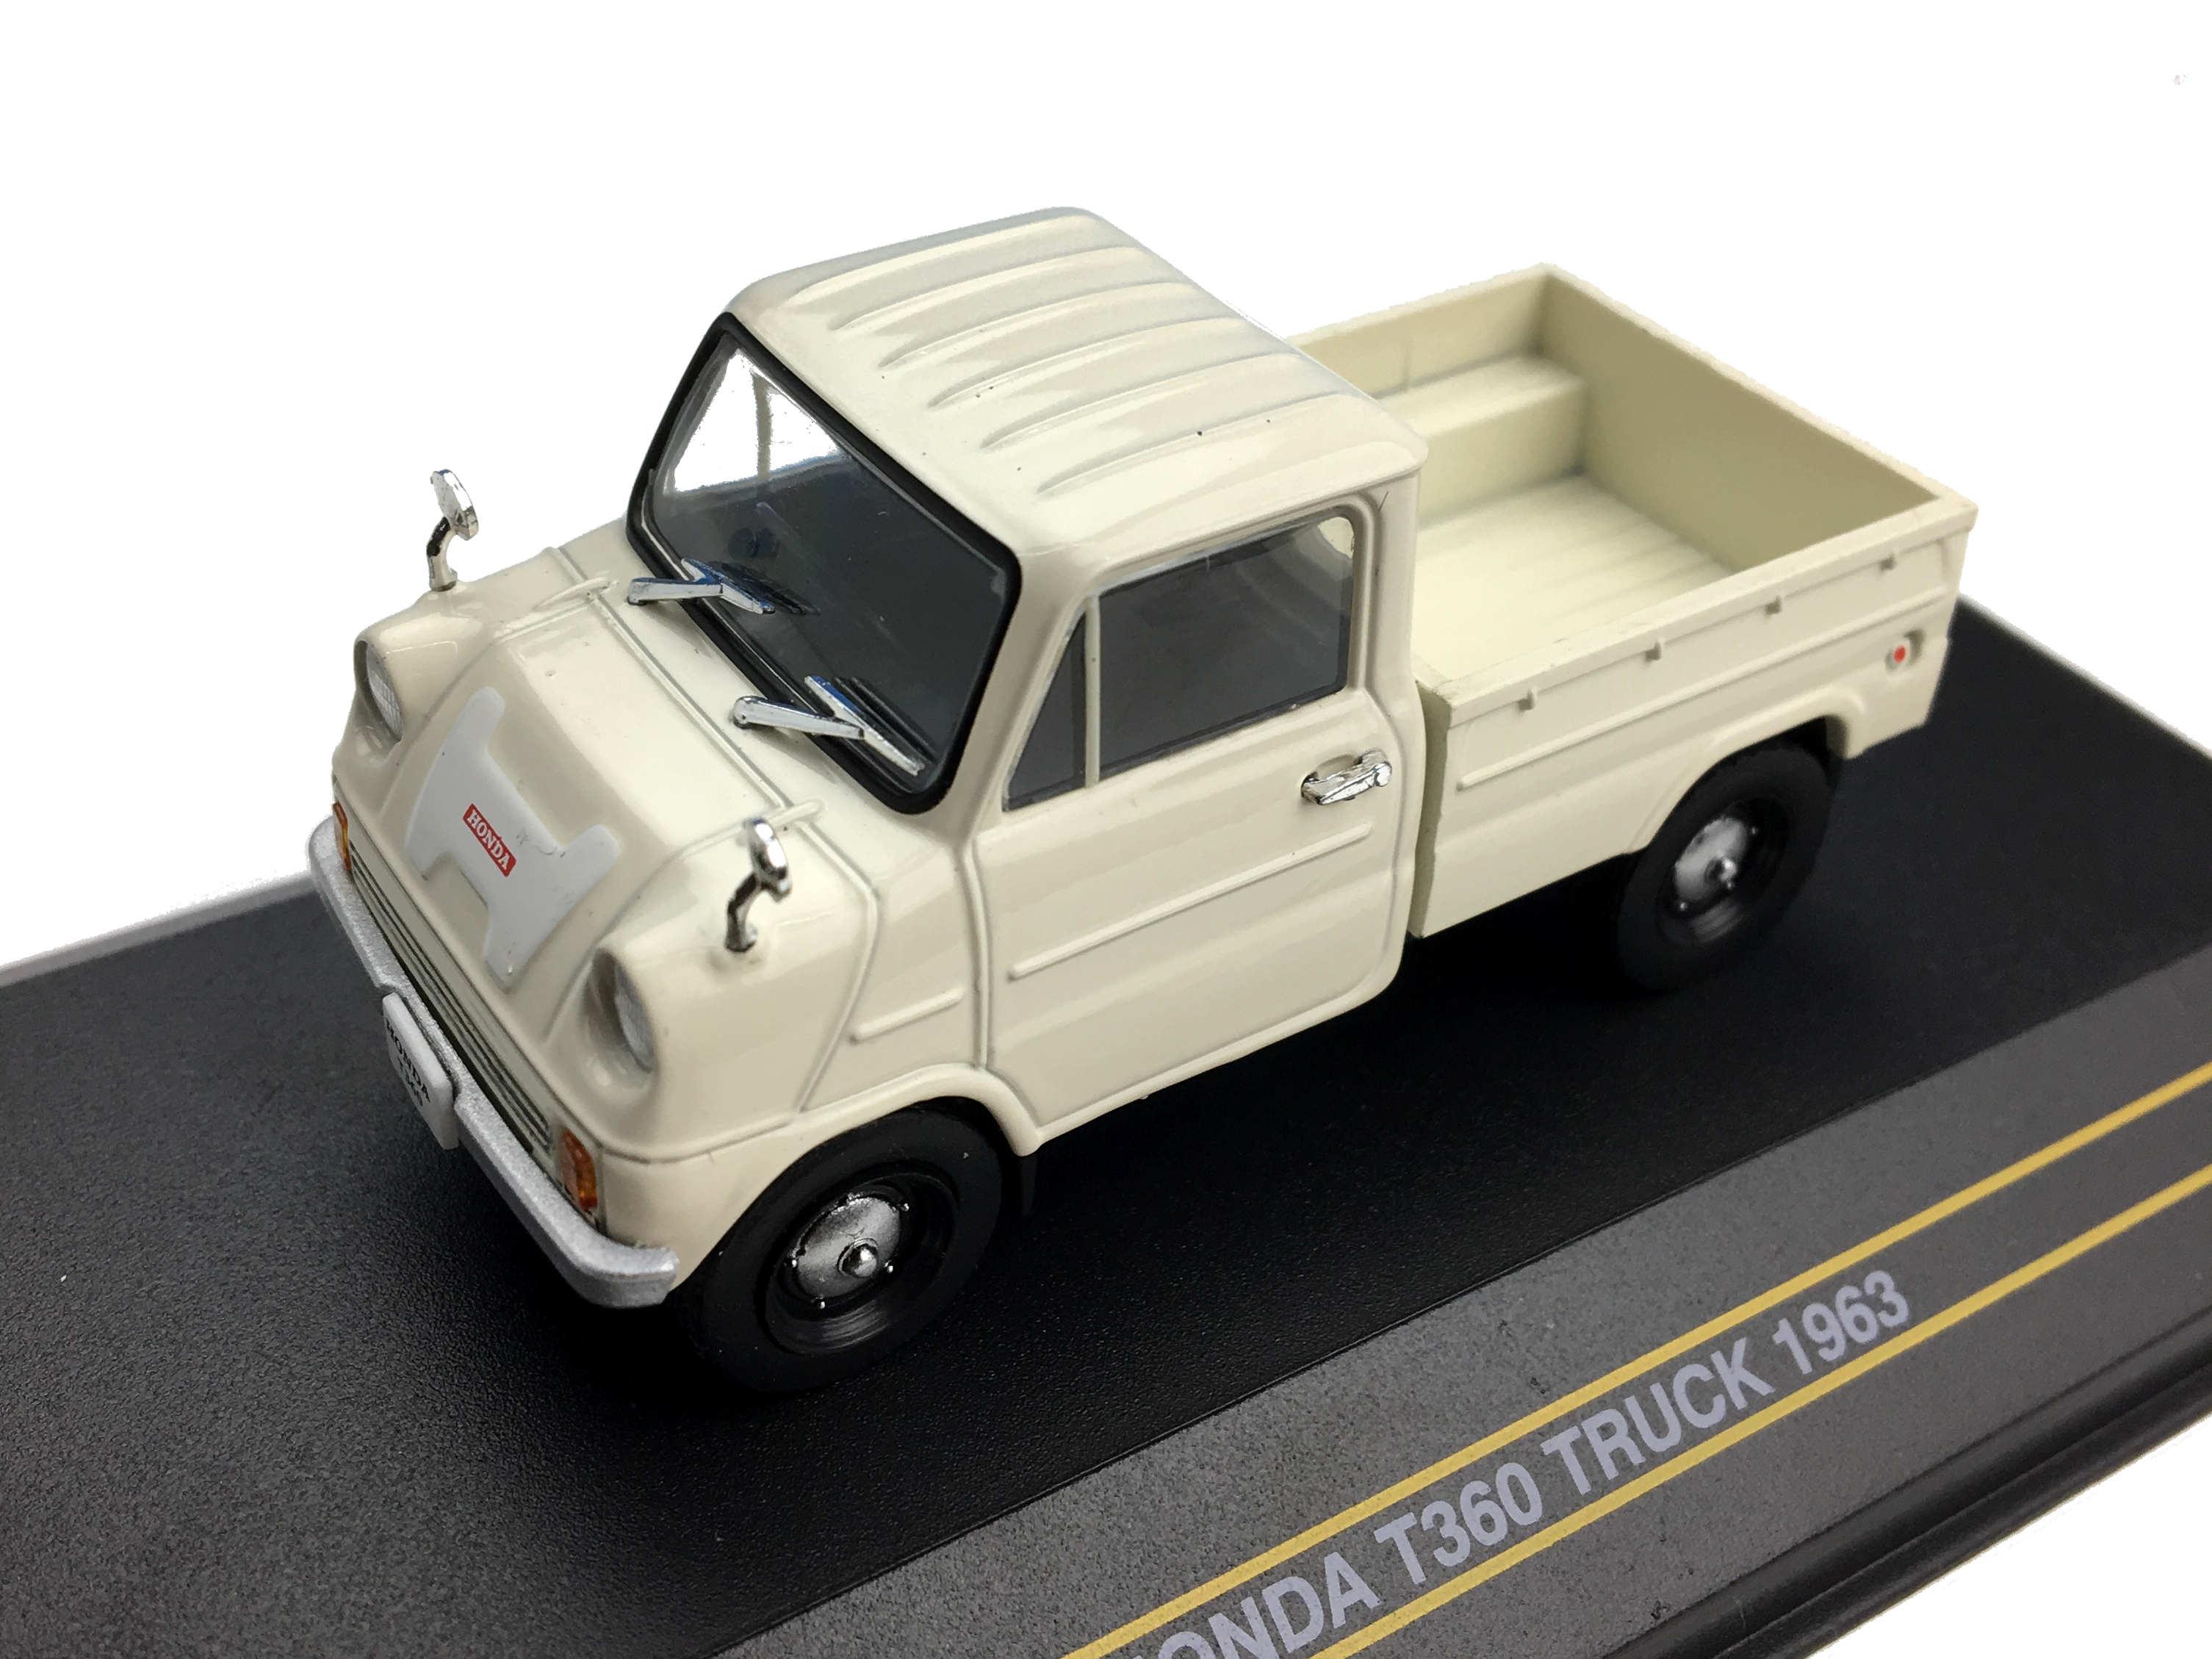 First43/ファースト43 ホンダ T360 トラック 1963 ベージュ